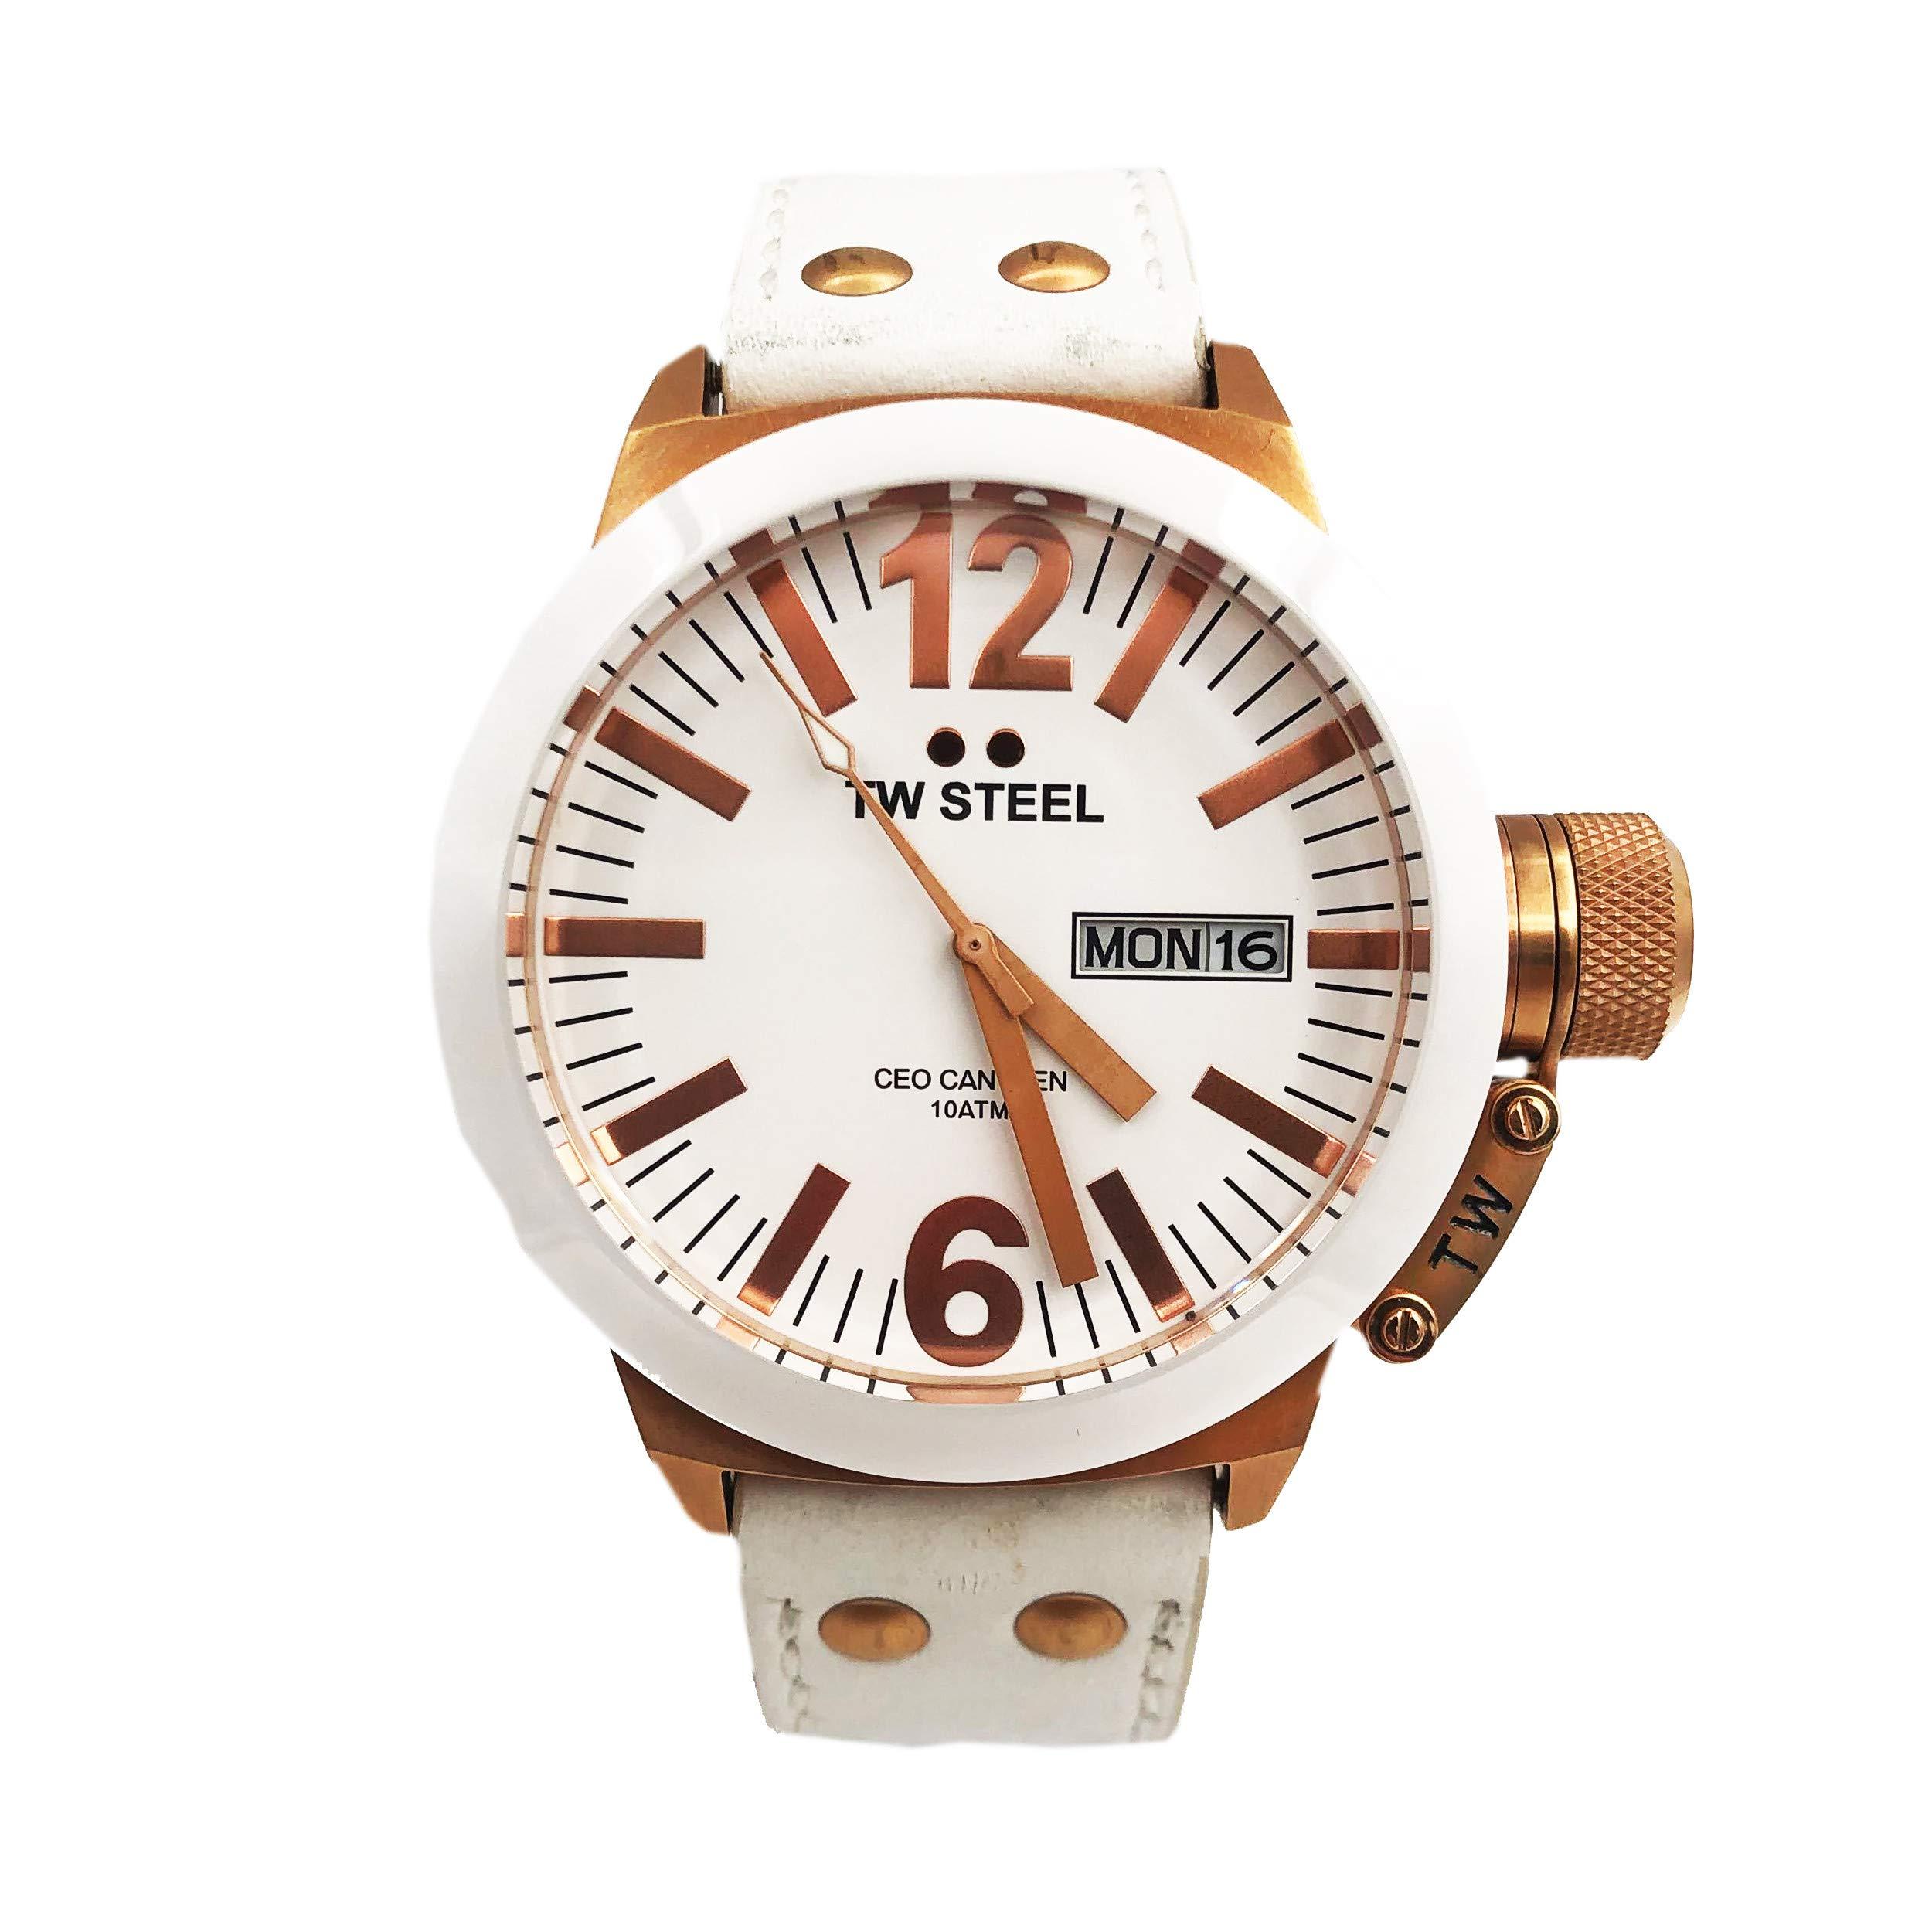 TW Steel CEO Quartz Male Watch CE1035 (Certified Pre-Owned)